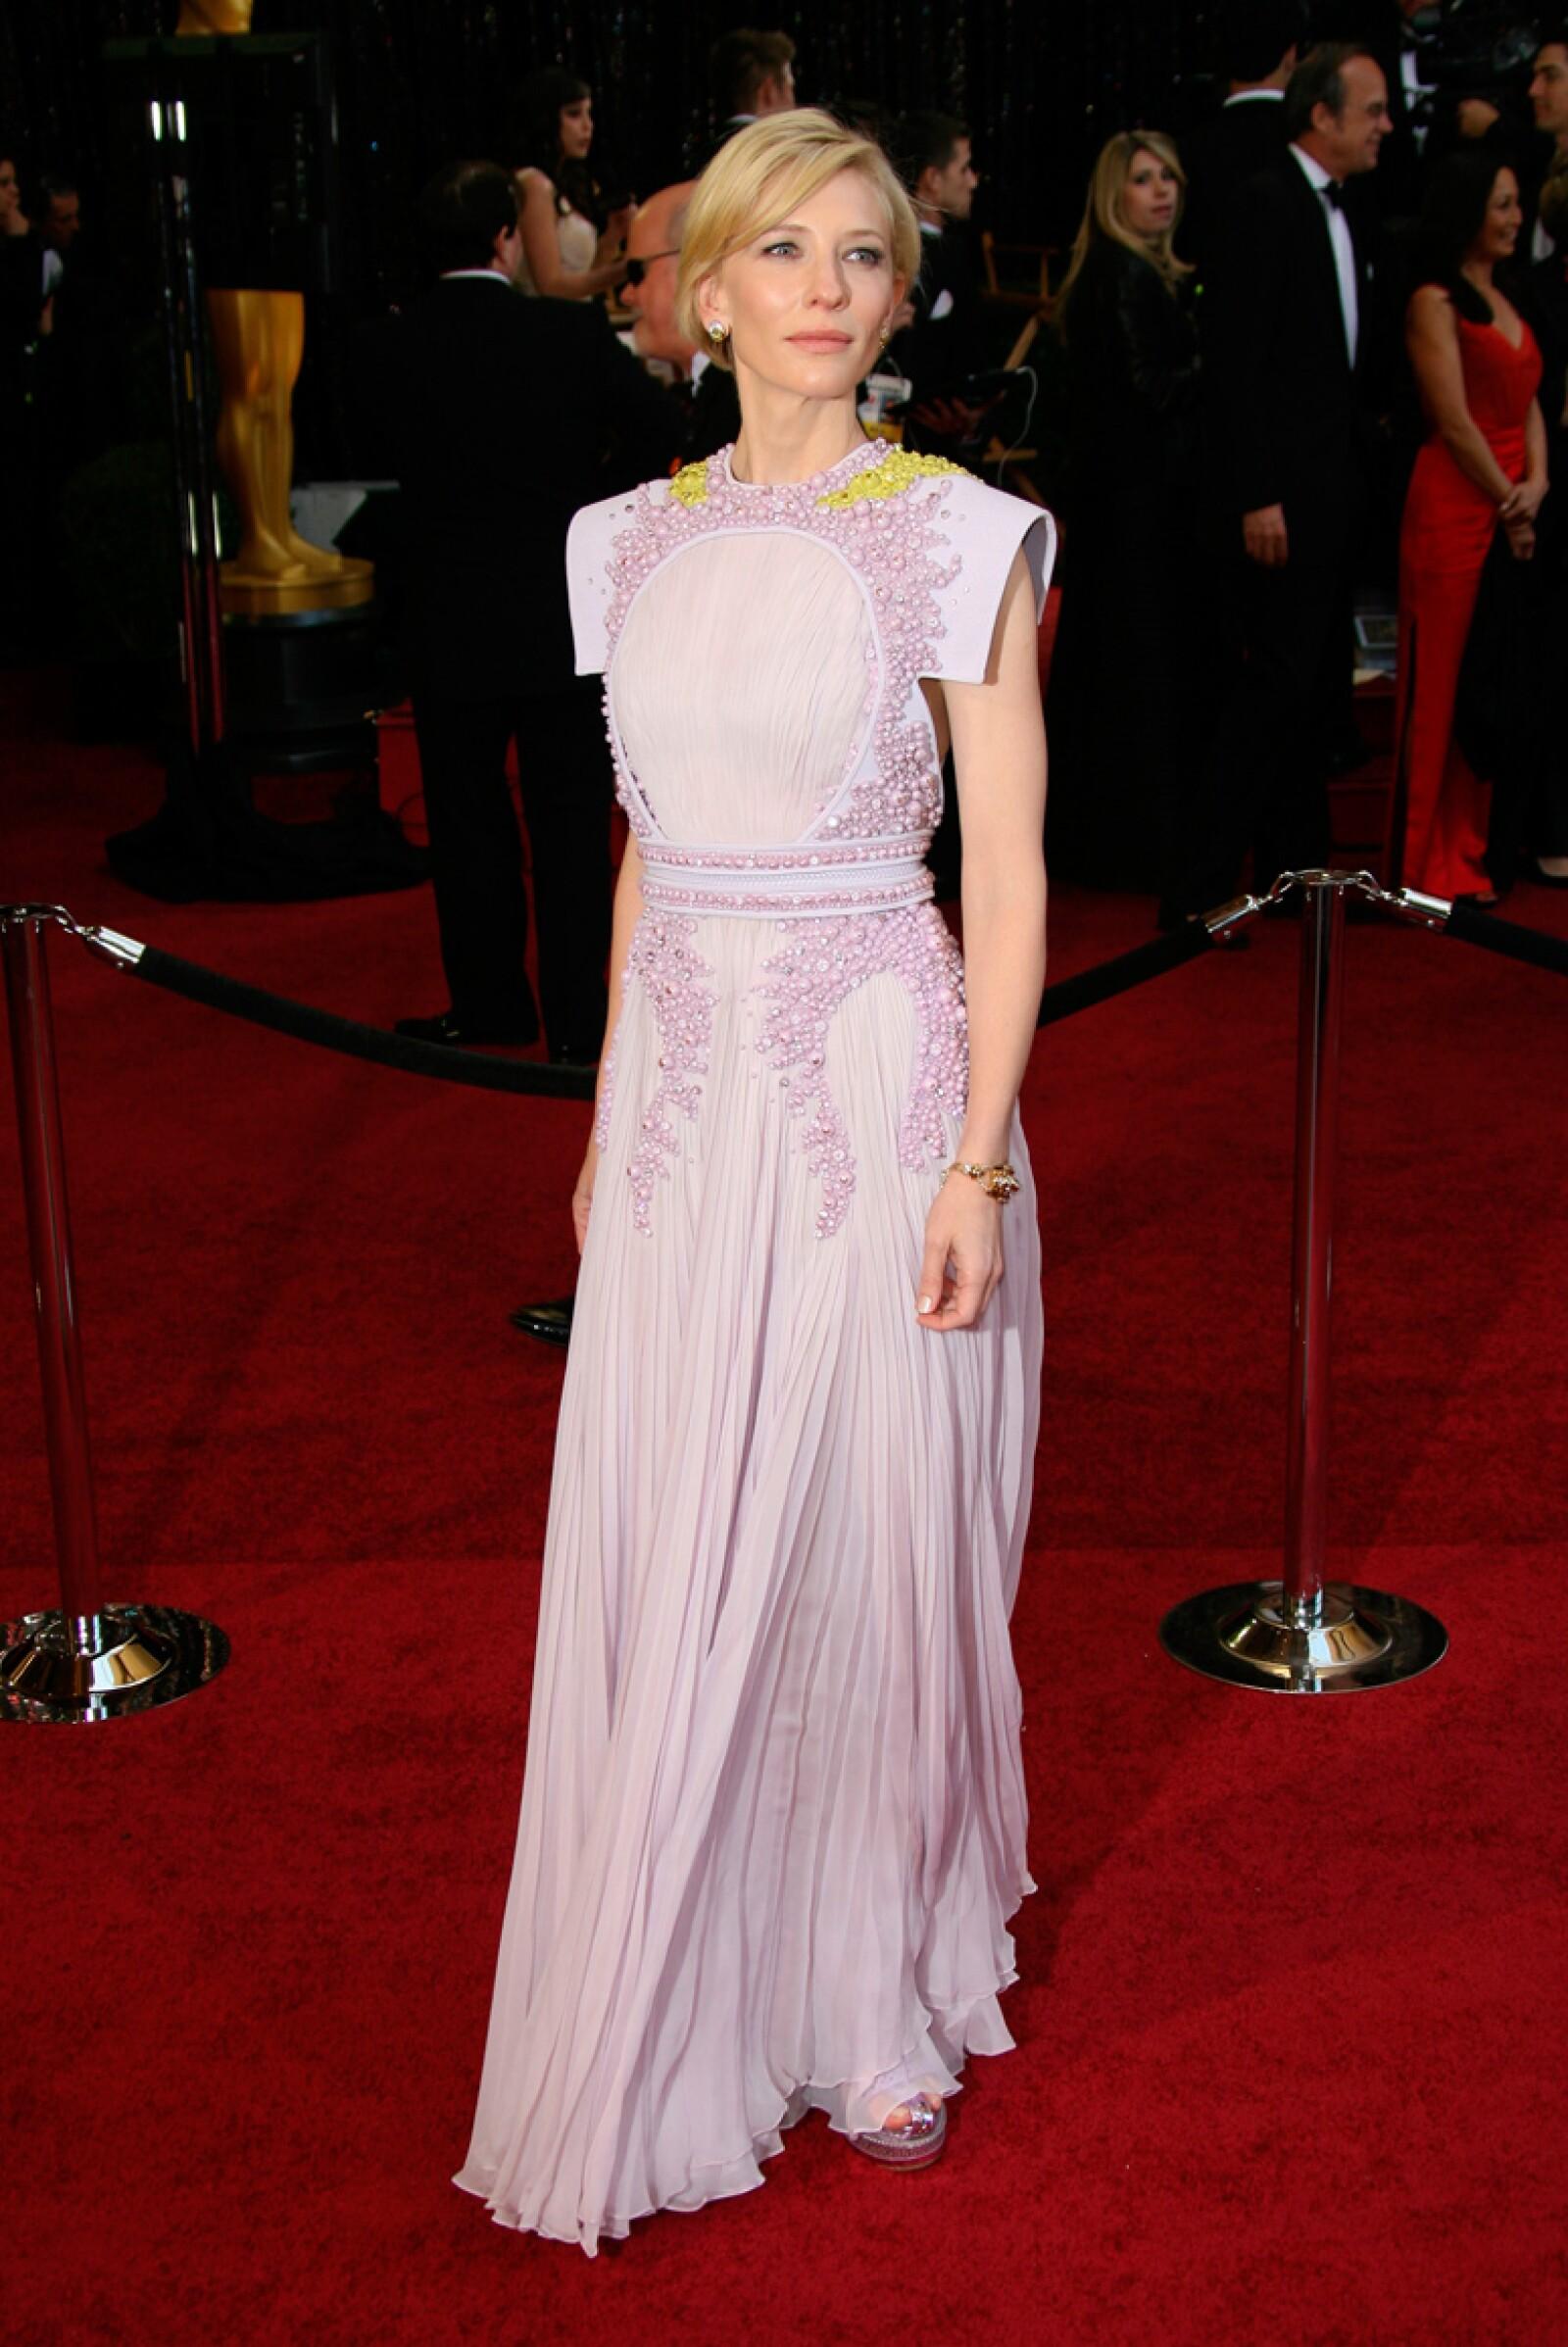 83rd Annual Academy Awards, Arrivals, Los Angeles, America - 27 Feb 2011